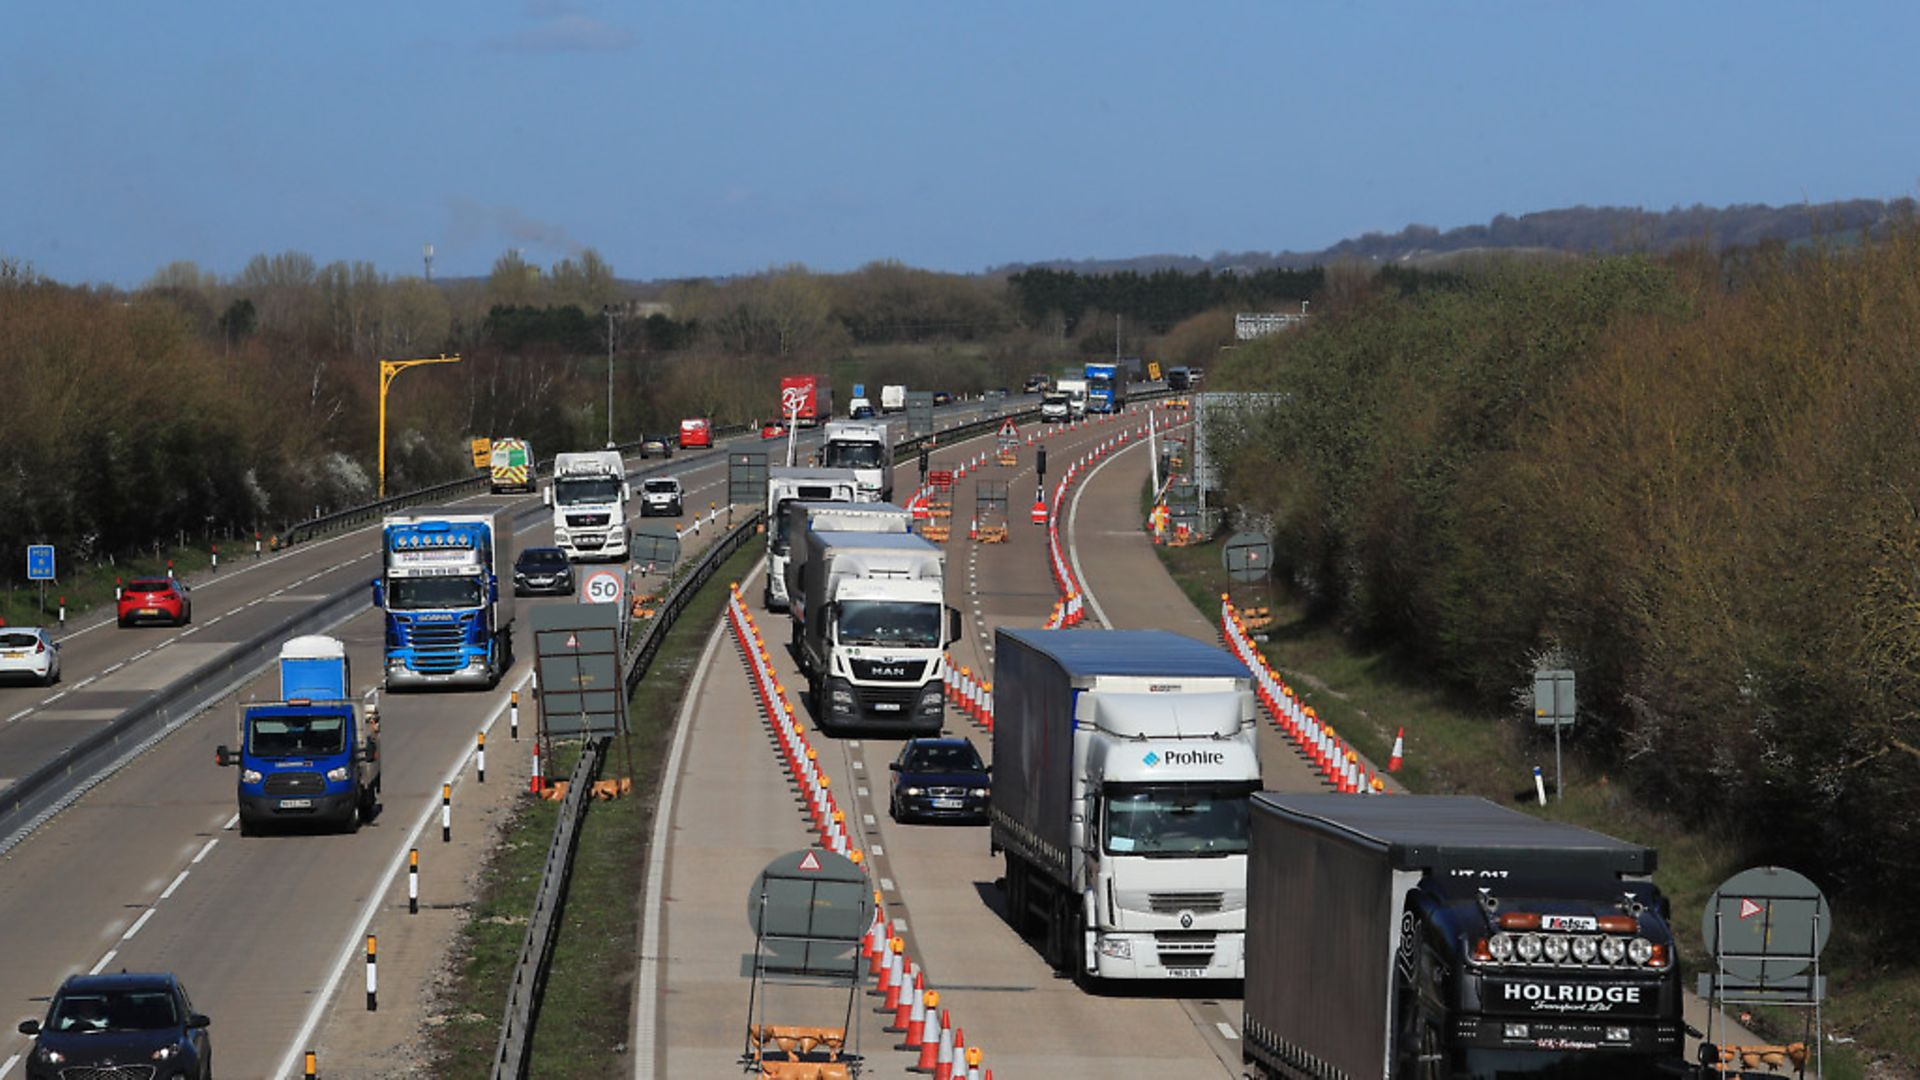 A view of the M20 motorway near Ashford in Kent. Photograph: Gareth Fuller/PA. - Credit: PA